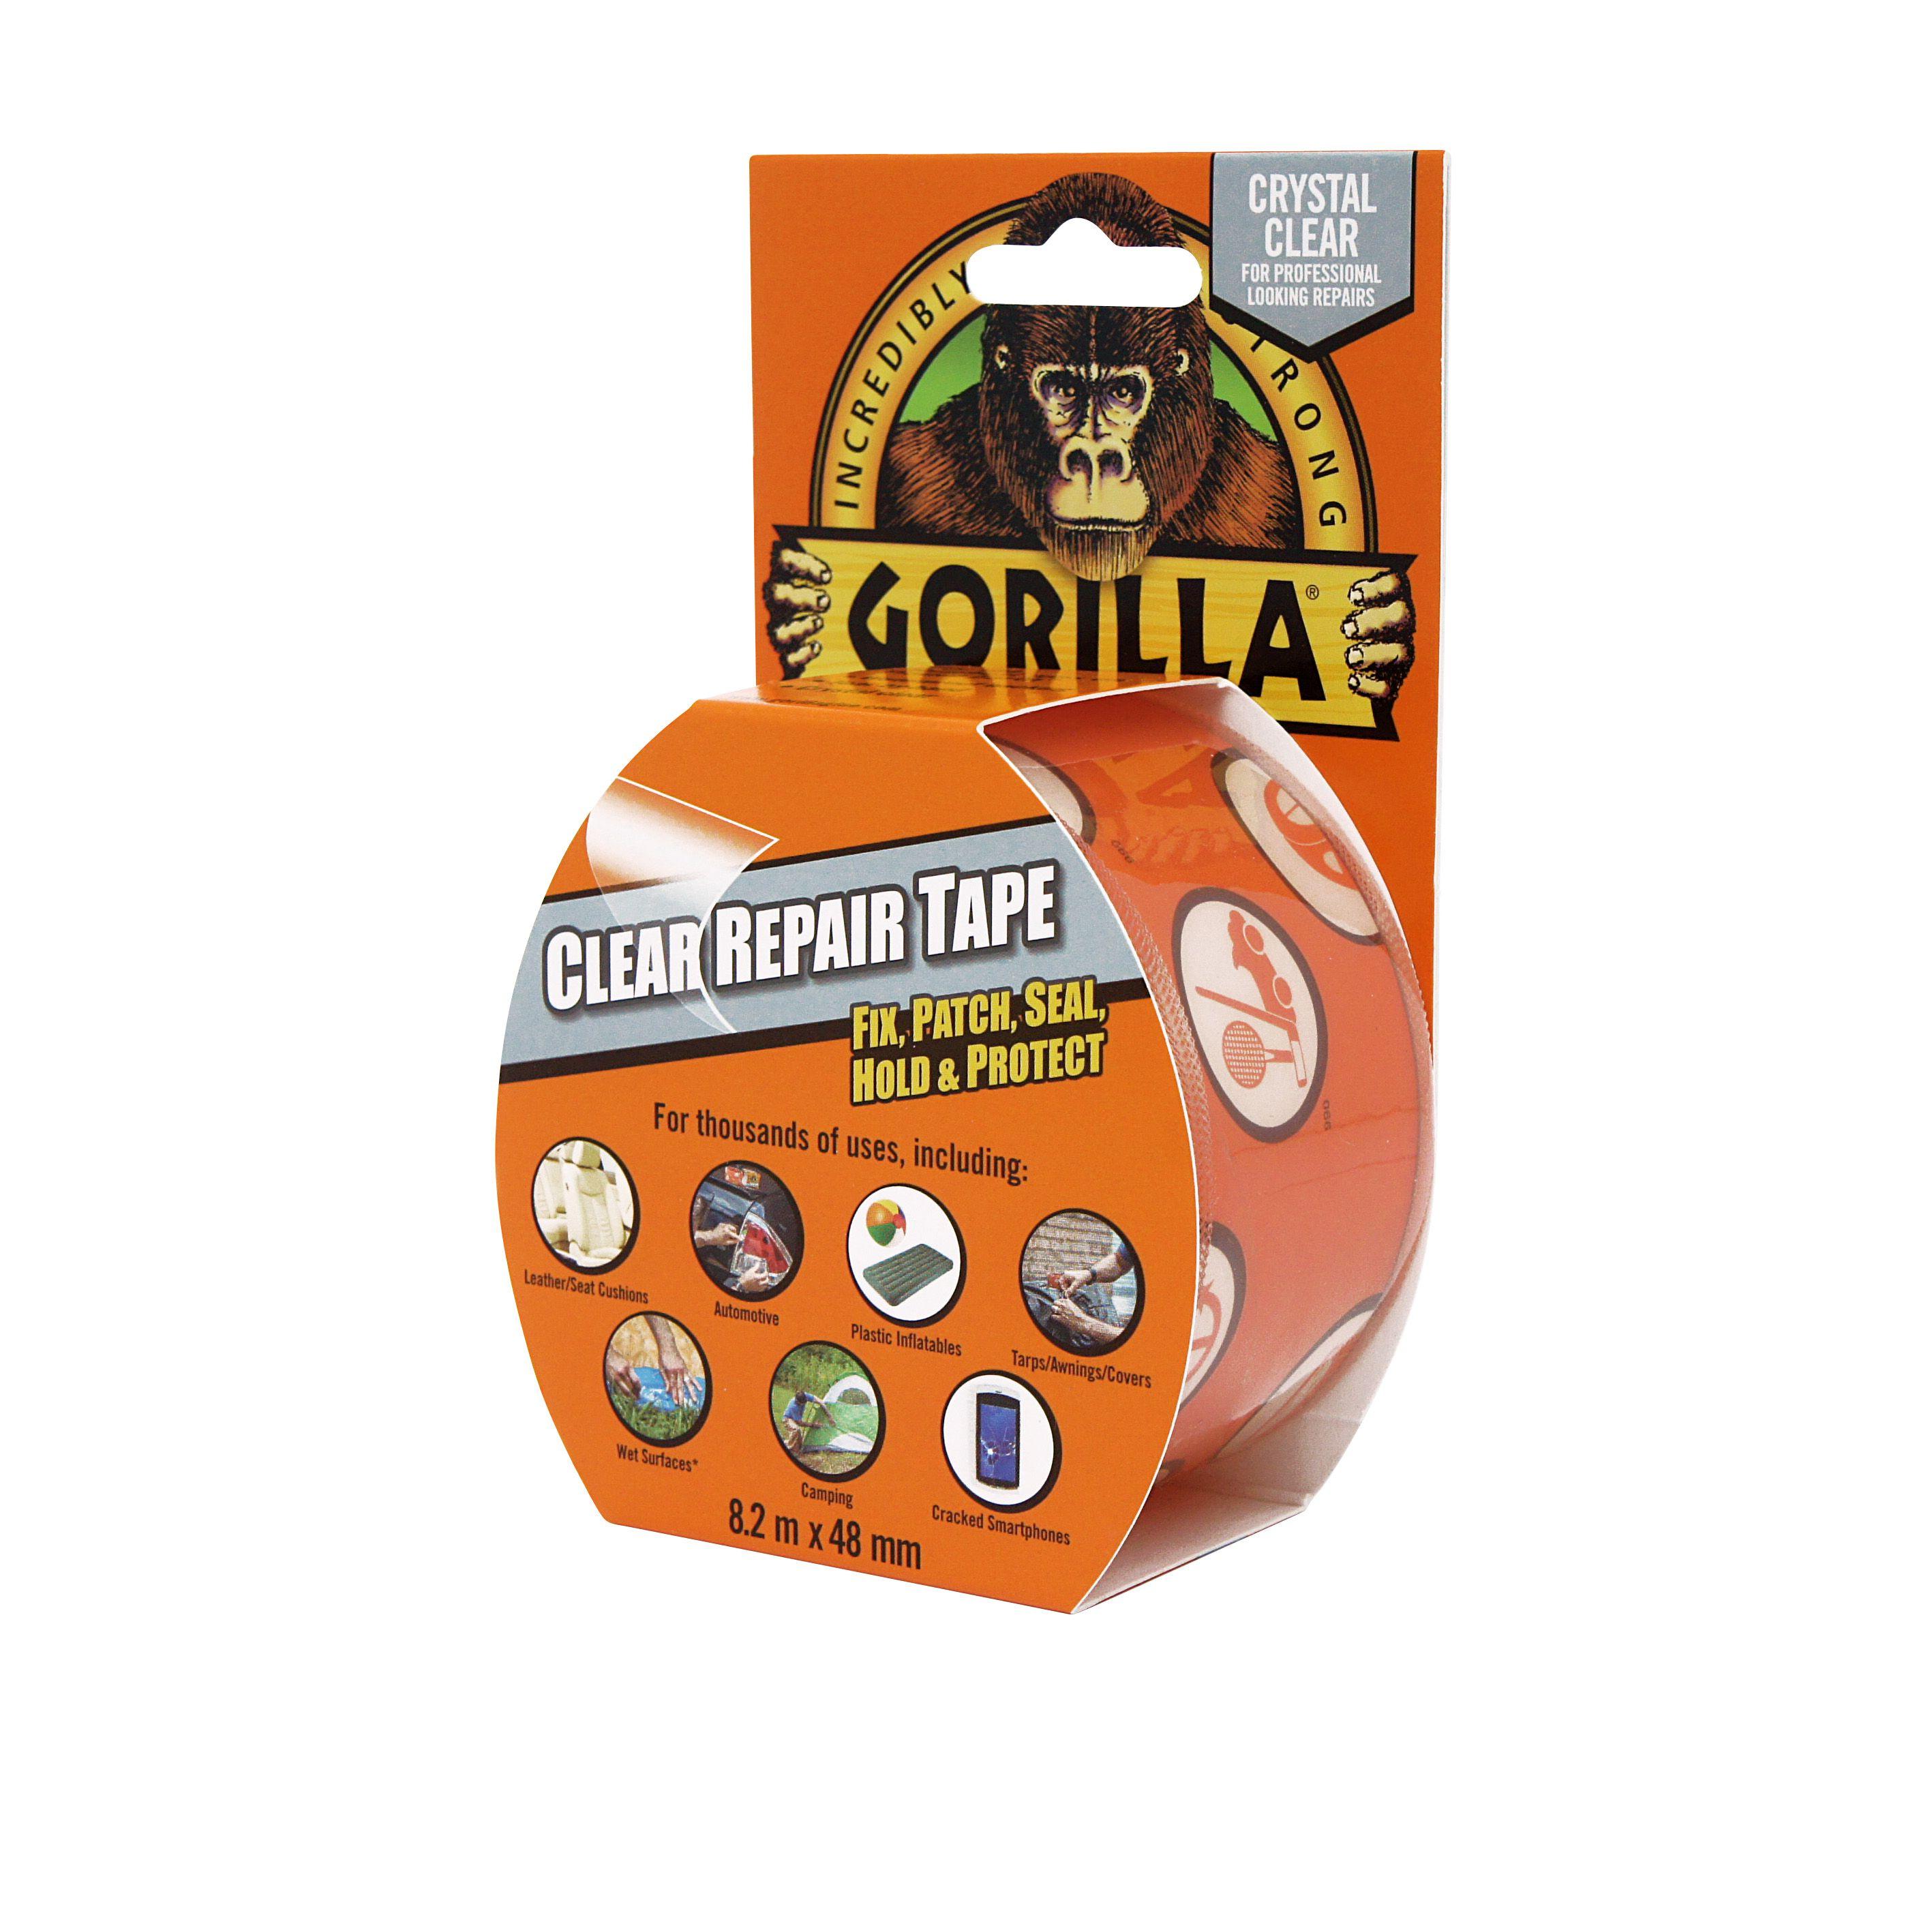 Gorilla Clear Repair glært límband